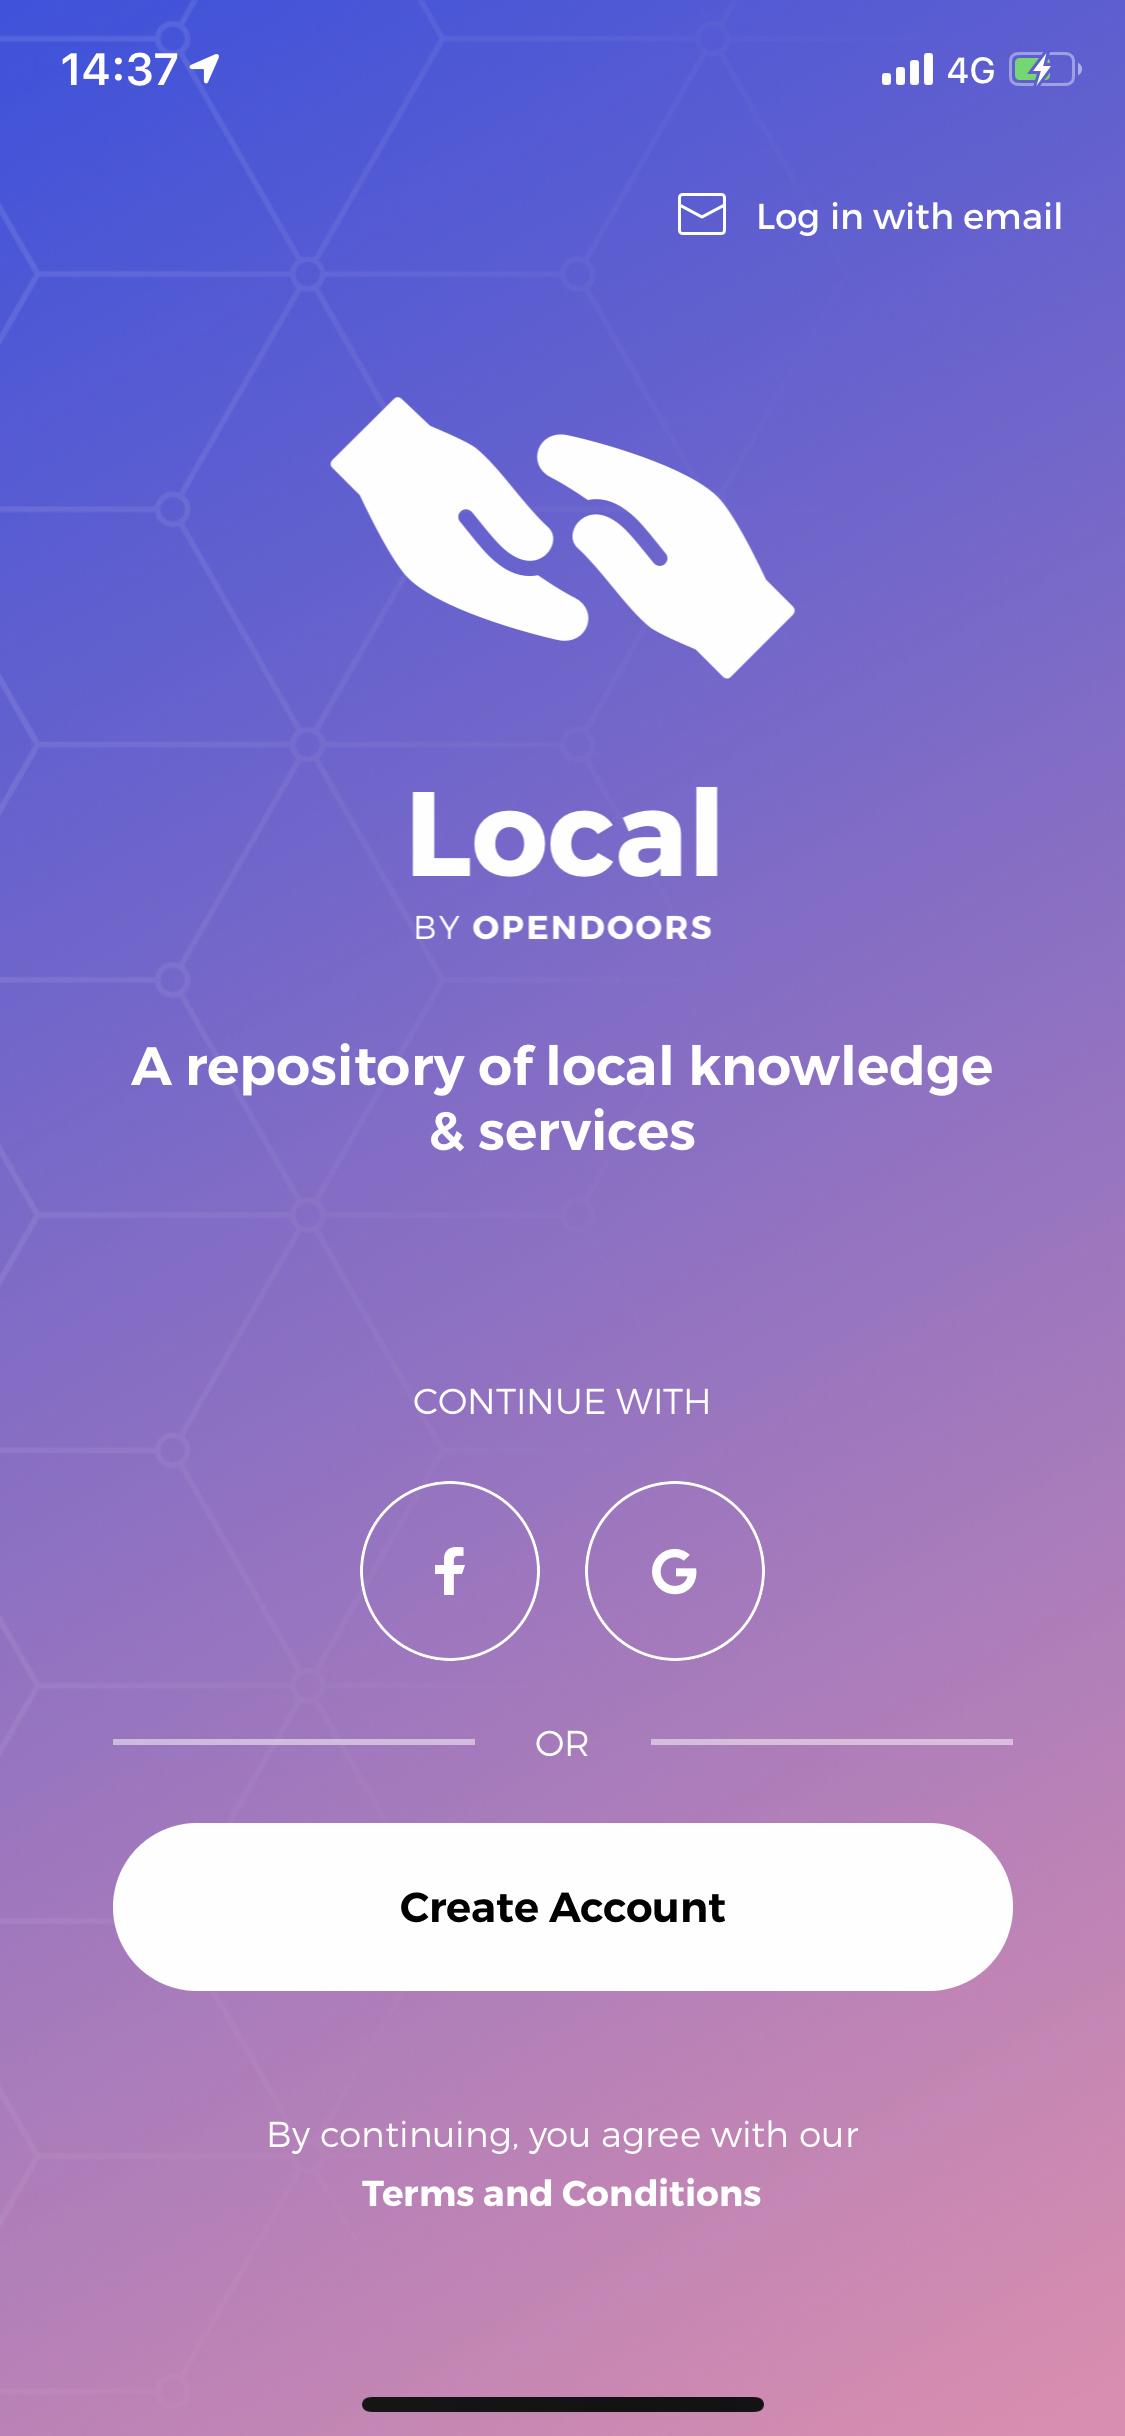 Local - Hyperlocal Quora w/ focus on small businesses & freelancers